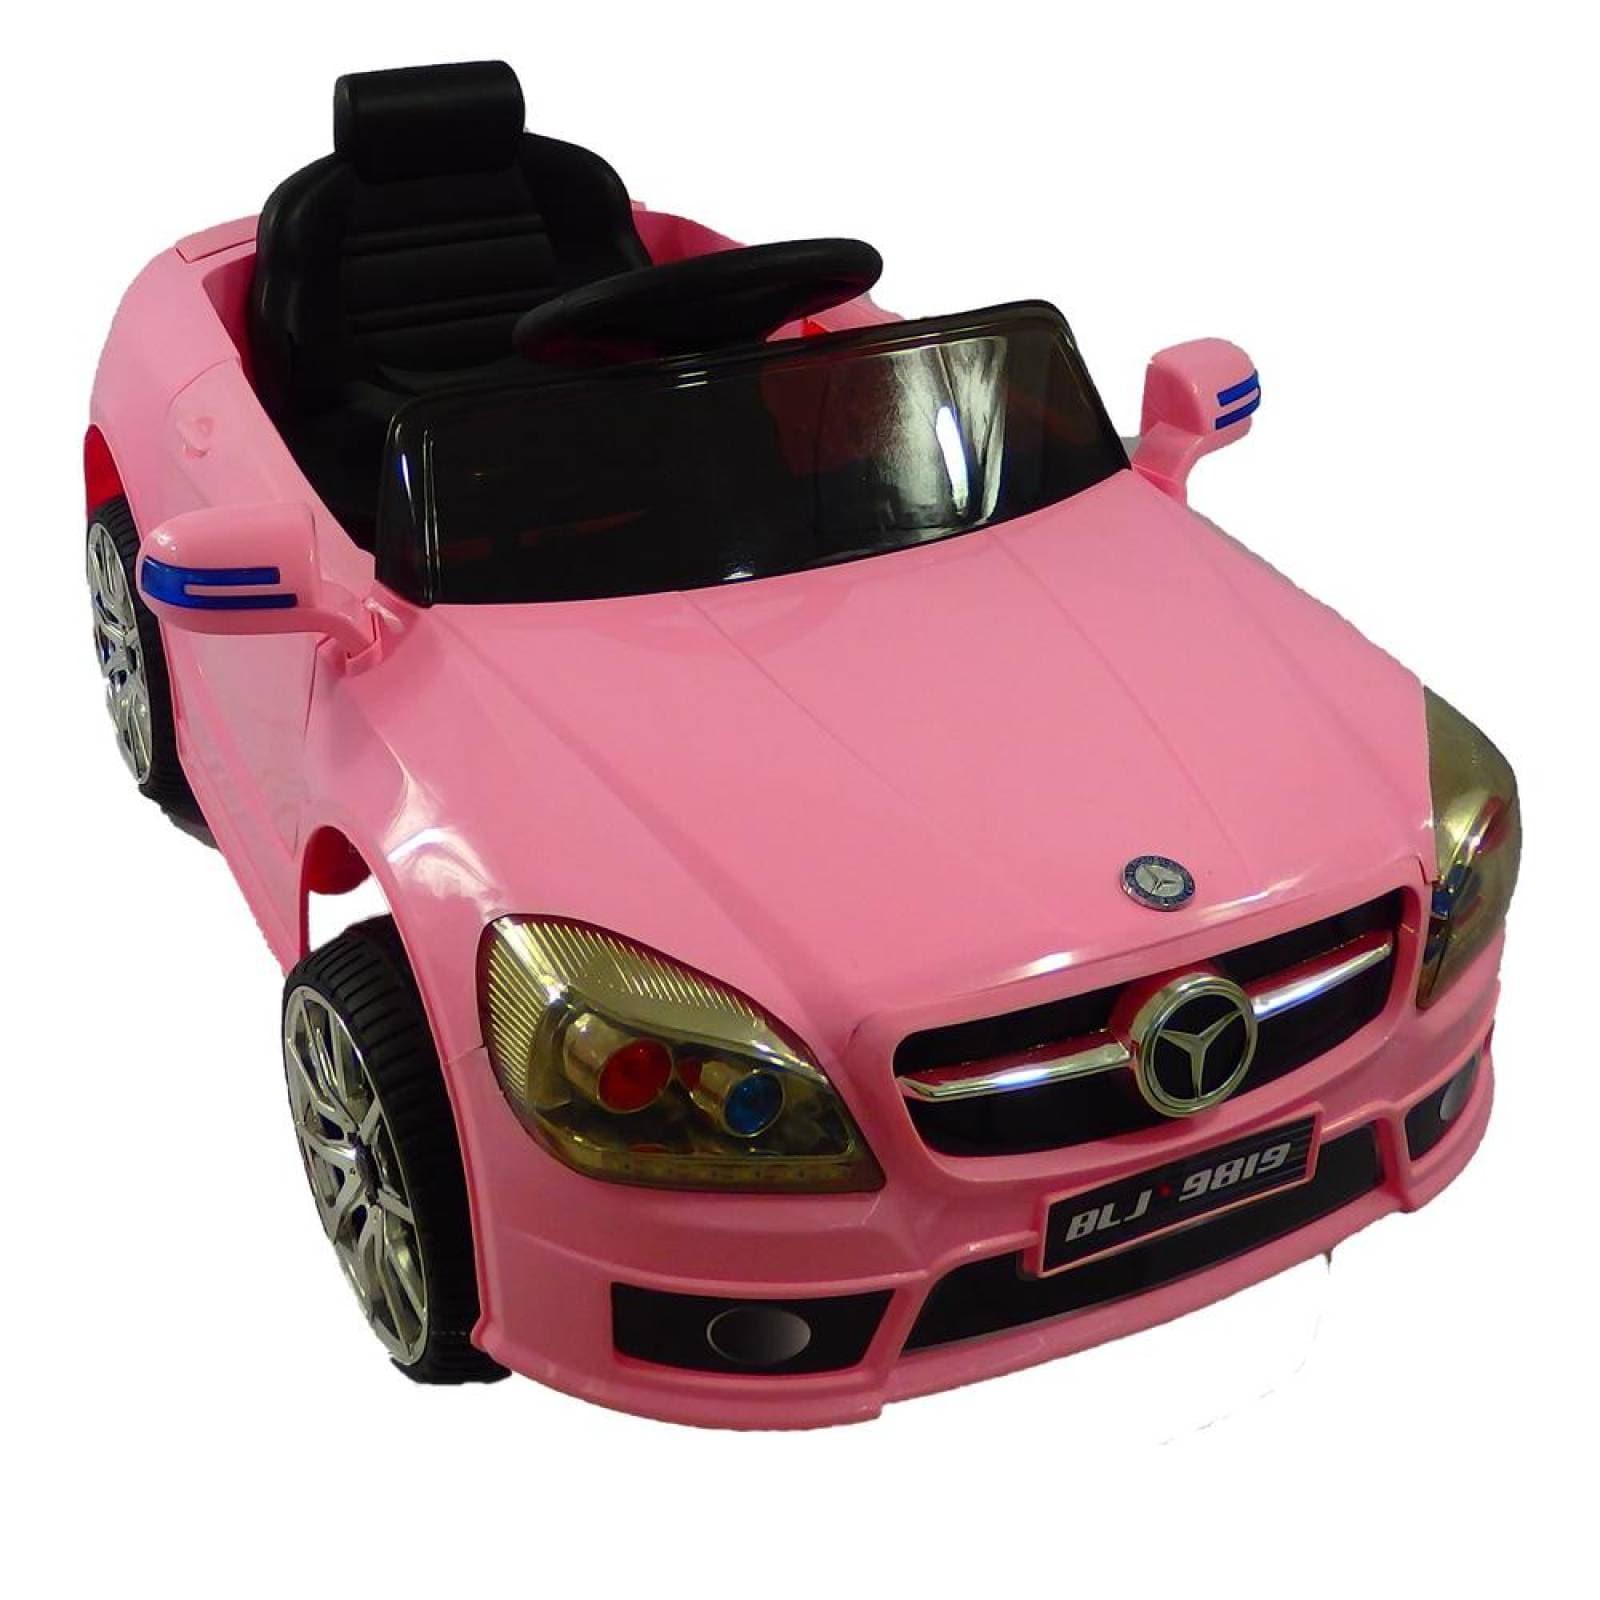 Carro Electrico Montable Con Control Remoto Mercedes Benz Rosa